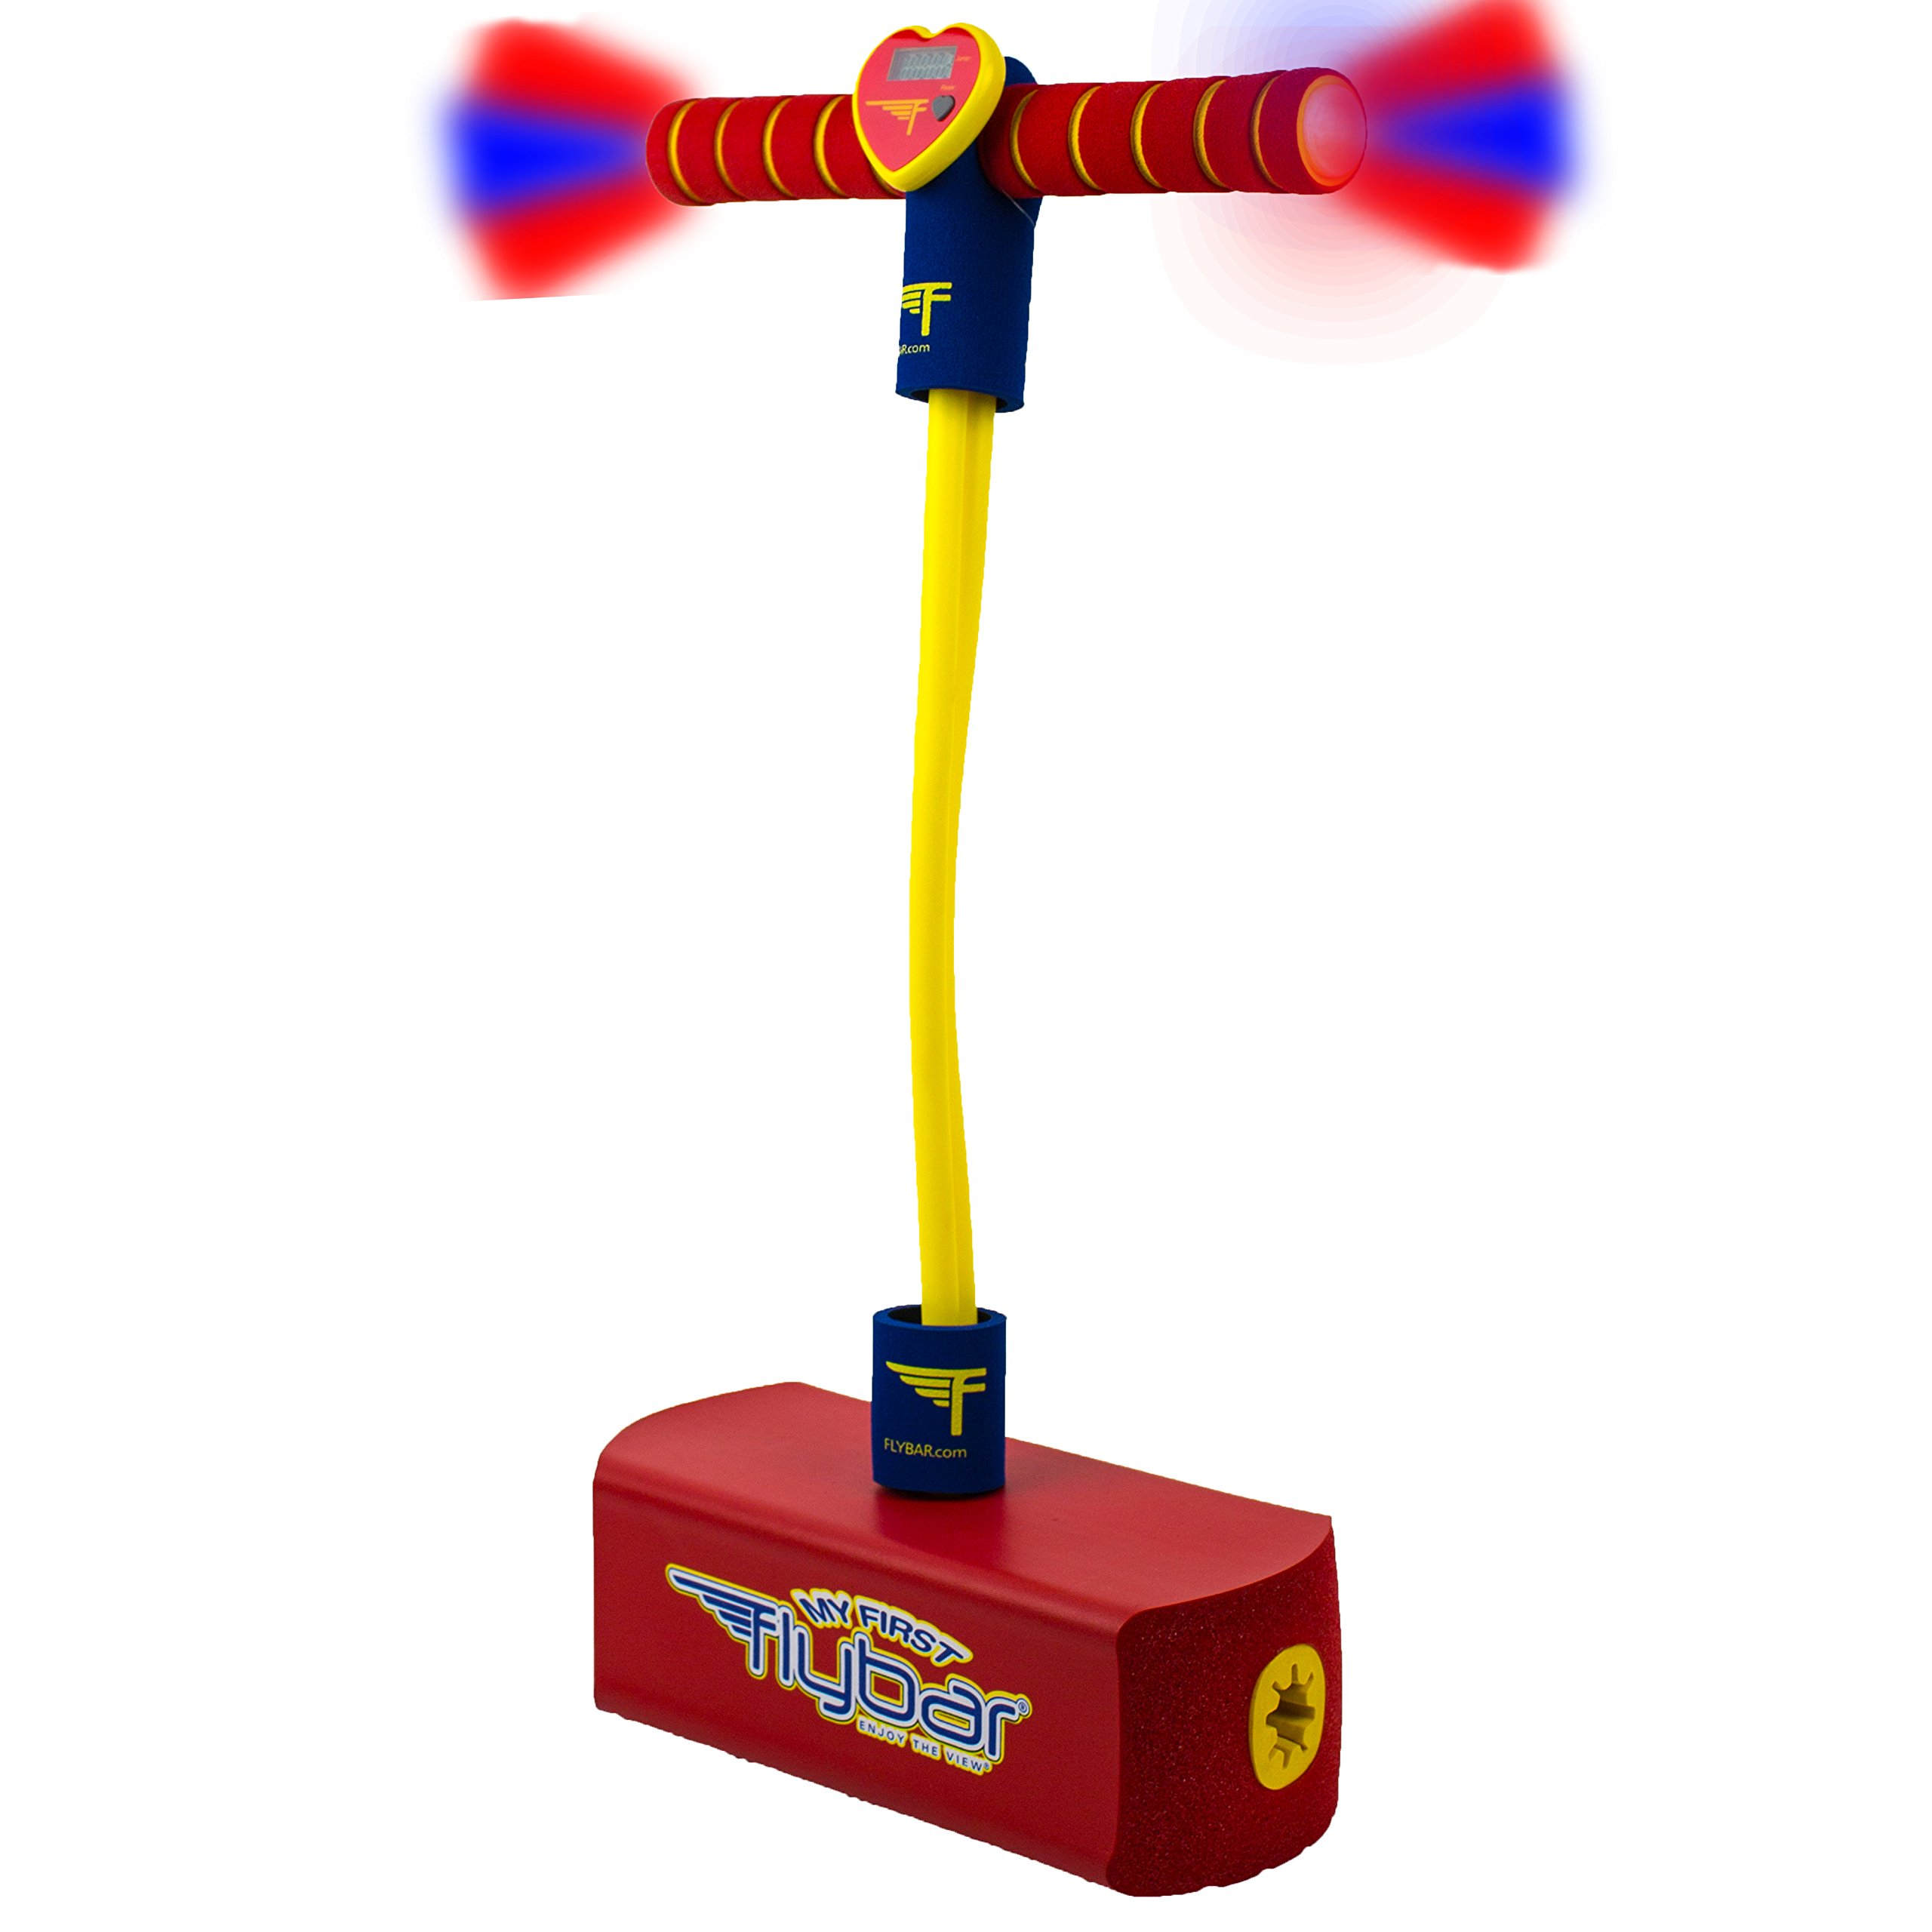 Flybar My First Foam Pogo Jumper With Flashing LED Lights & Pogo Counter Safe Pogo Hopper For Kids Ages 3 & Up (Red LED)